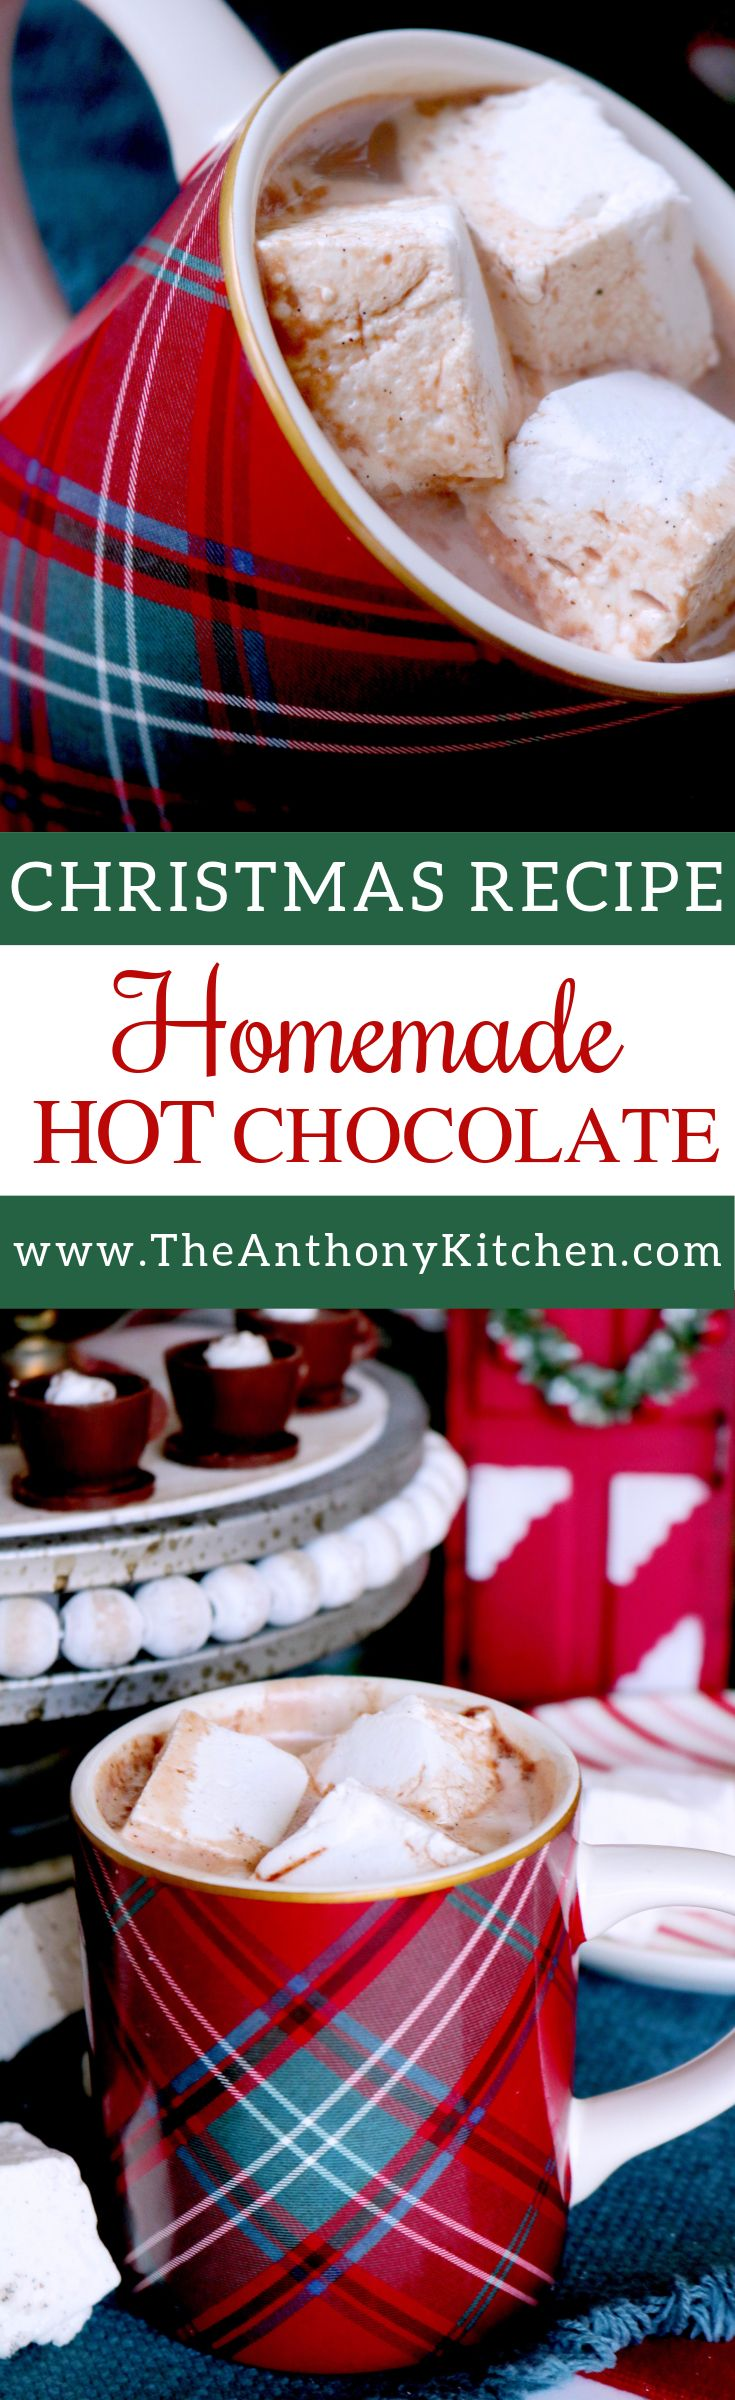 Homemade Hot Cocoa Recipe   The best homemade hot chocolate recipe features a simple stovetop mix of cocoa powder, sugar, vanilla, milk, and cream   #hotcocoarecipe #homemadehotcocoa #homemadehotchocolate #hotchocolaterecipe